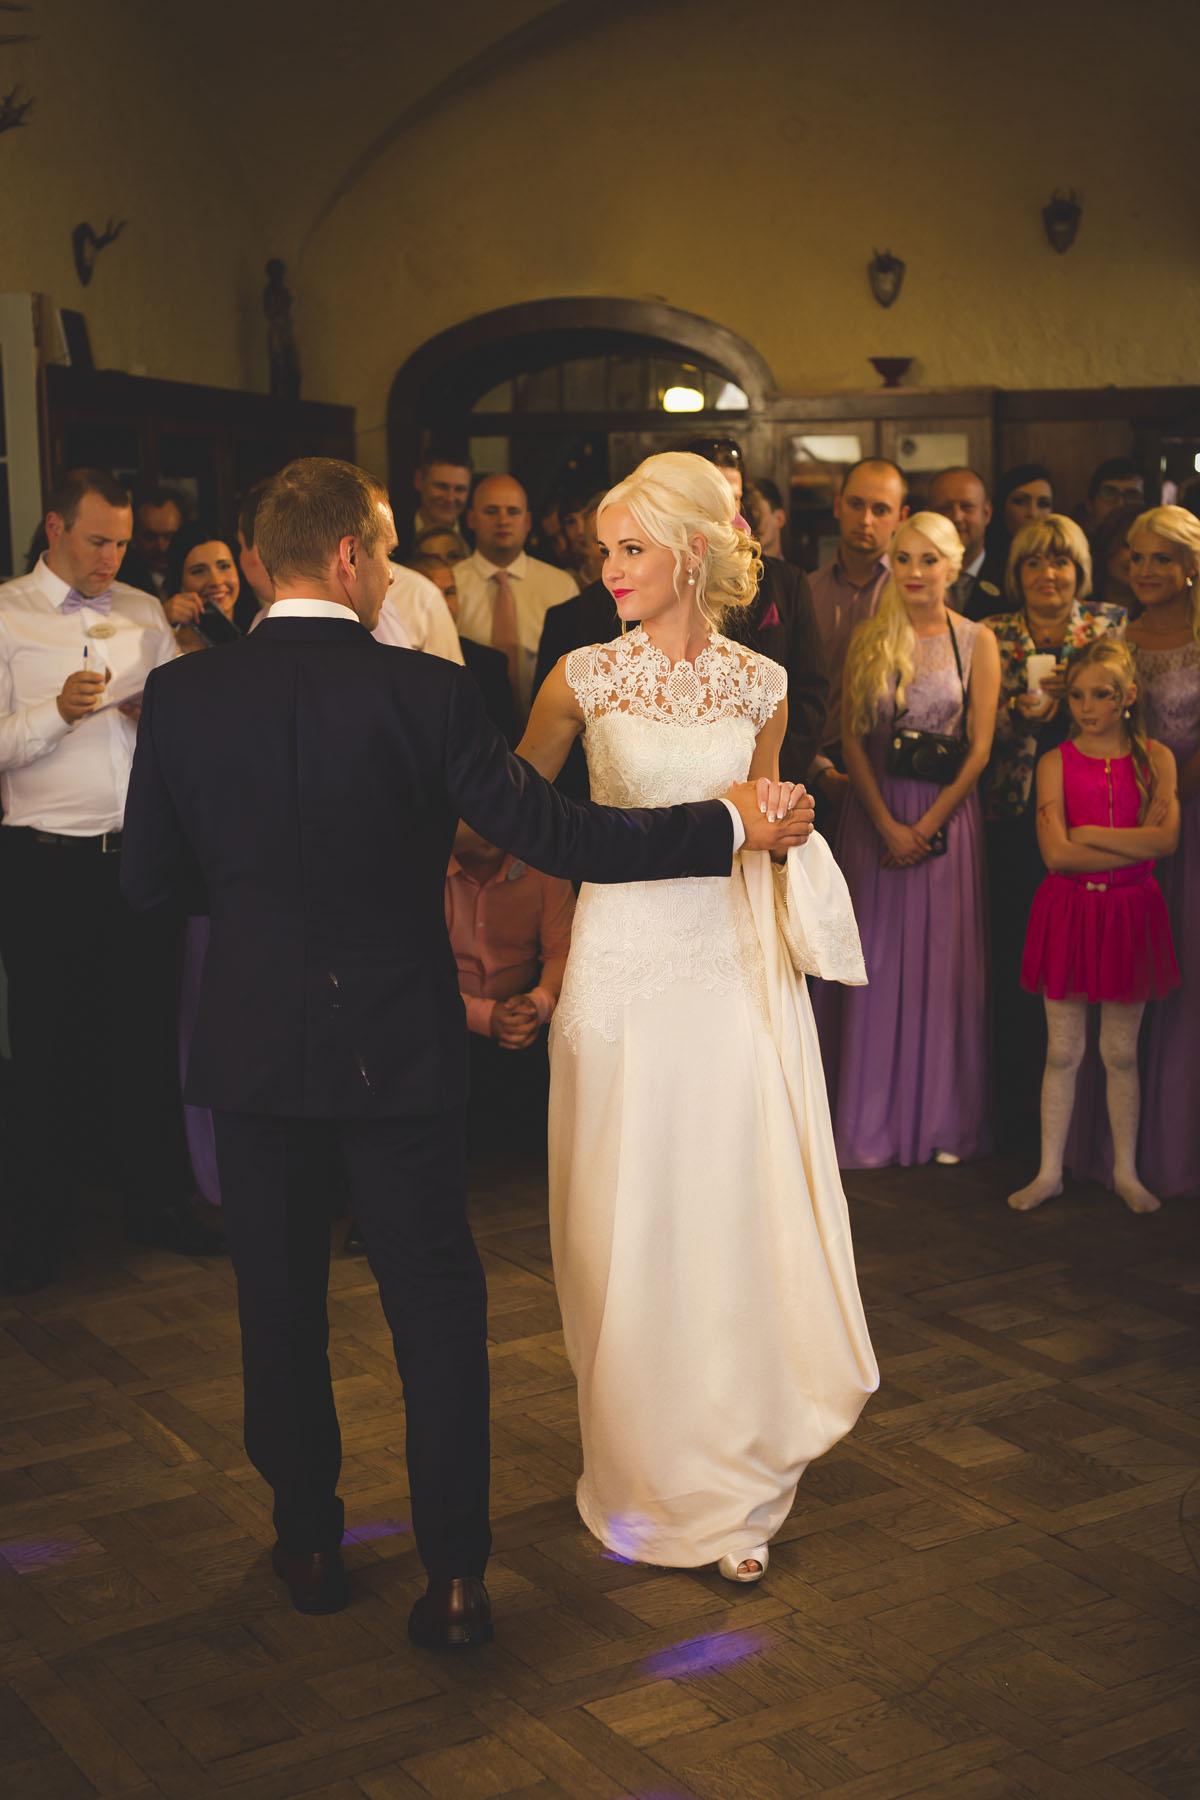 wedding-photos-120-taagepera-wedding-photographer.jpg